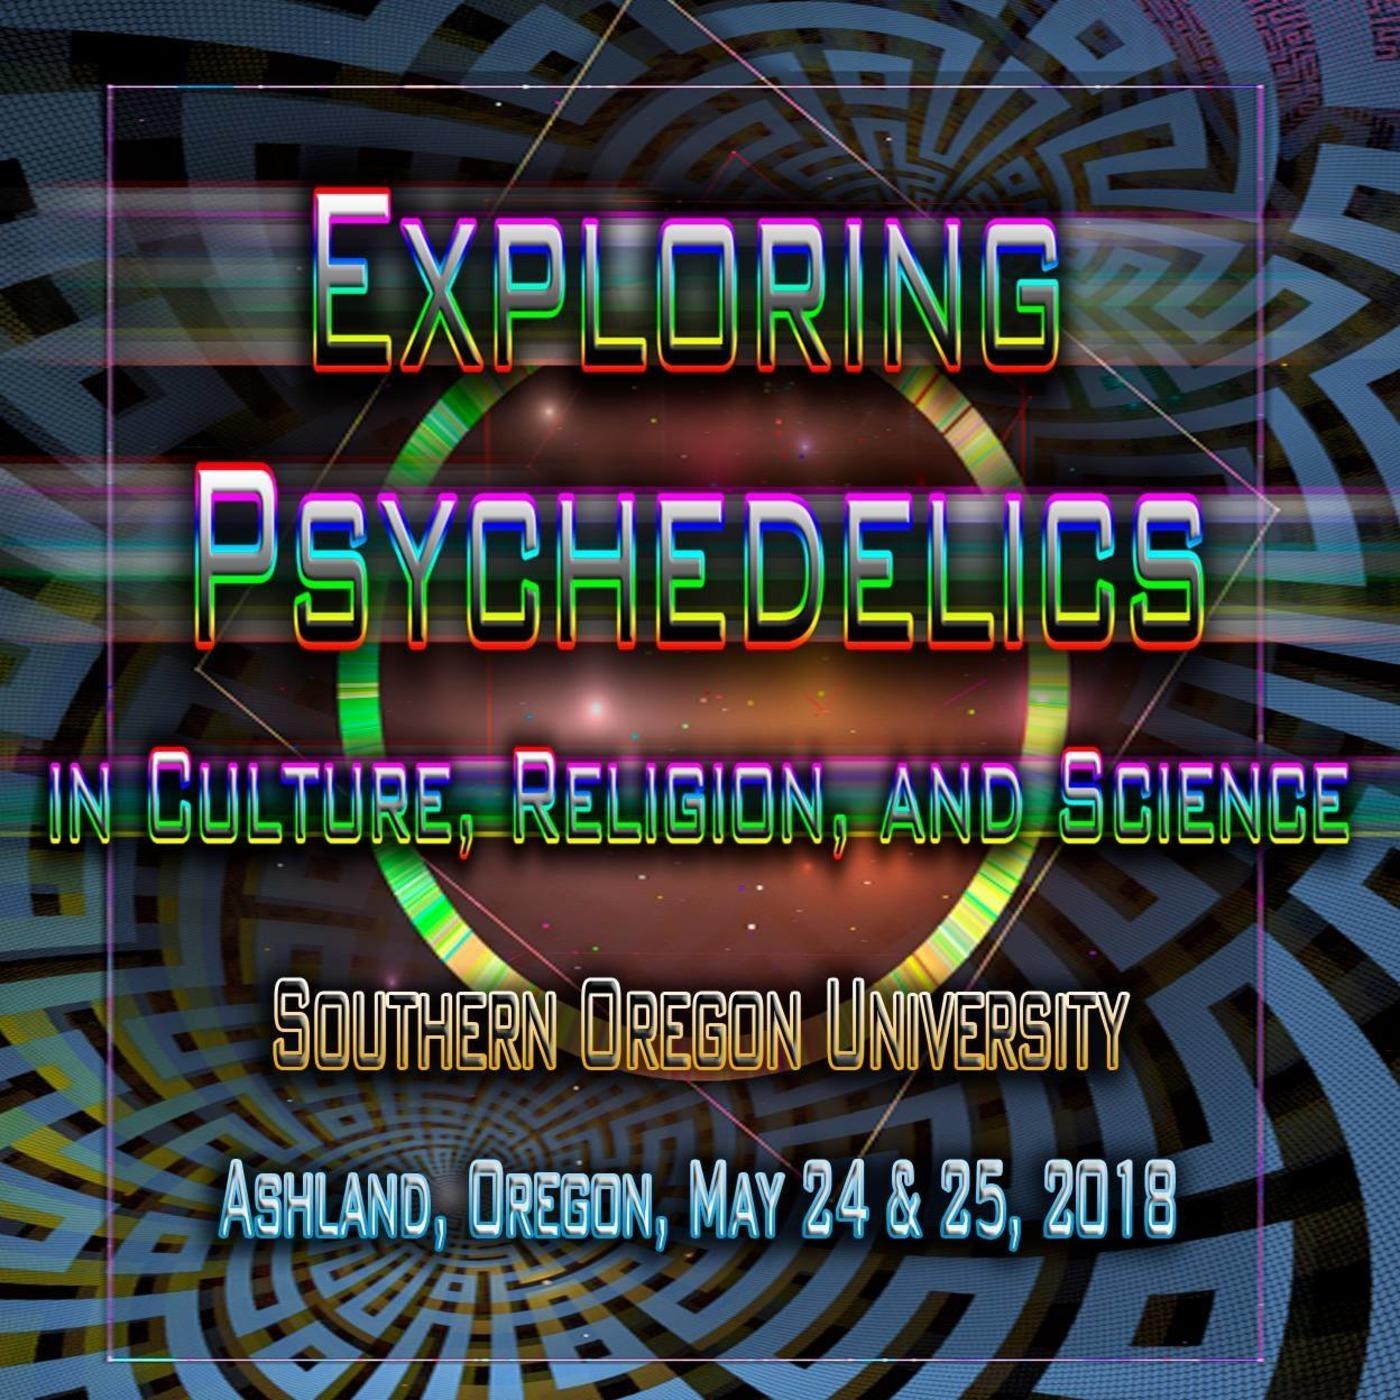 Exploring Psychedelics 2018: Octavio Rettig The Entheogenic